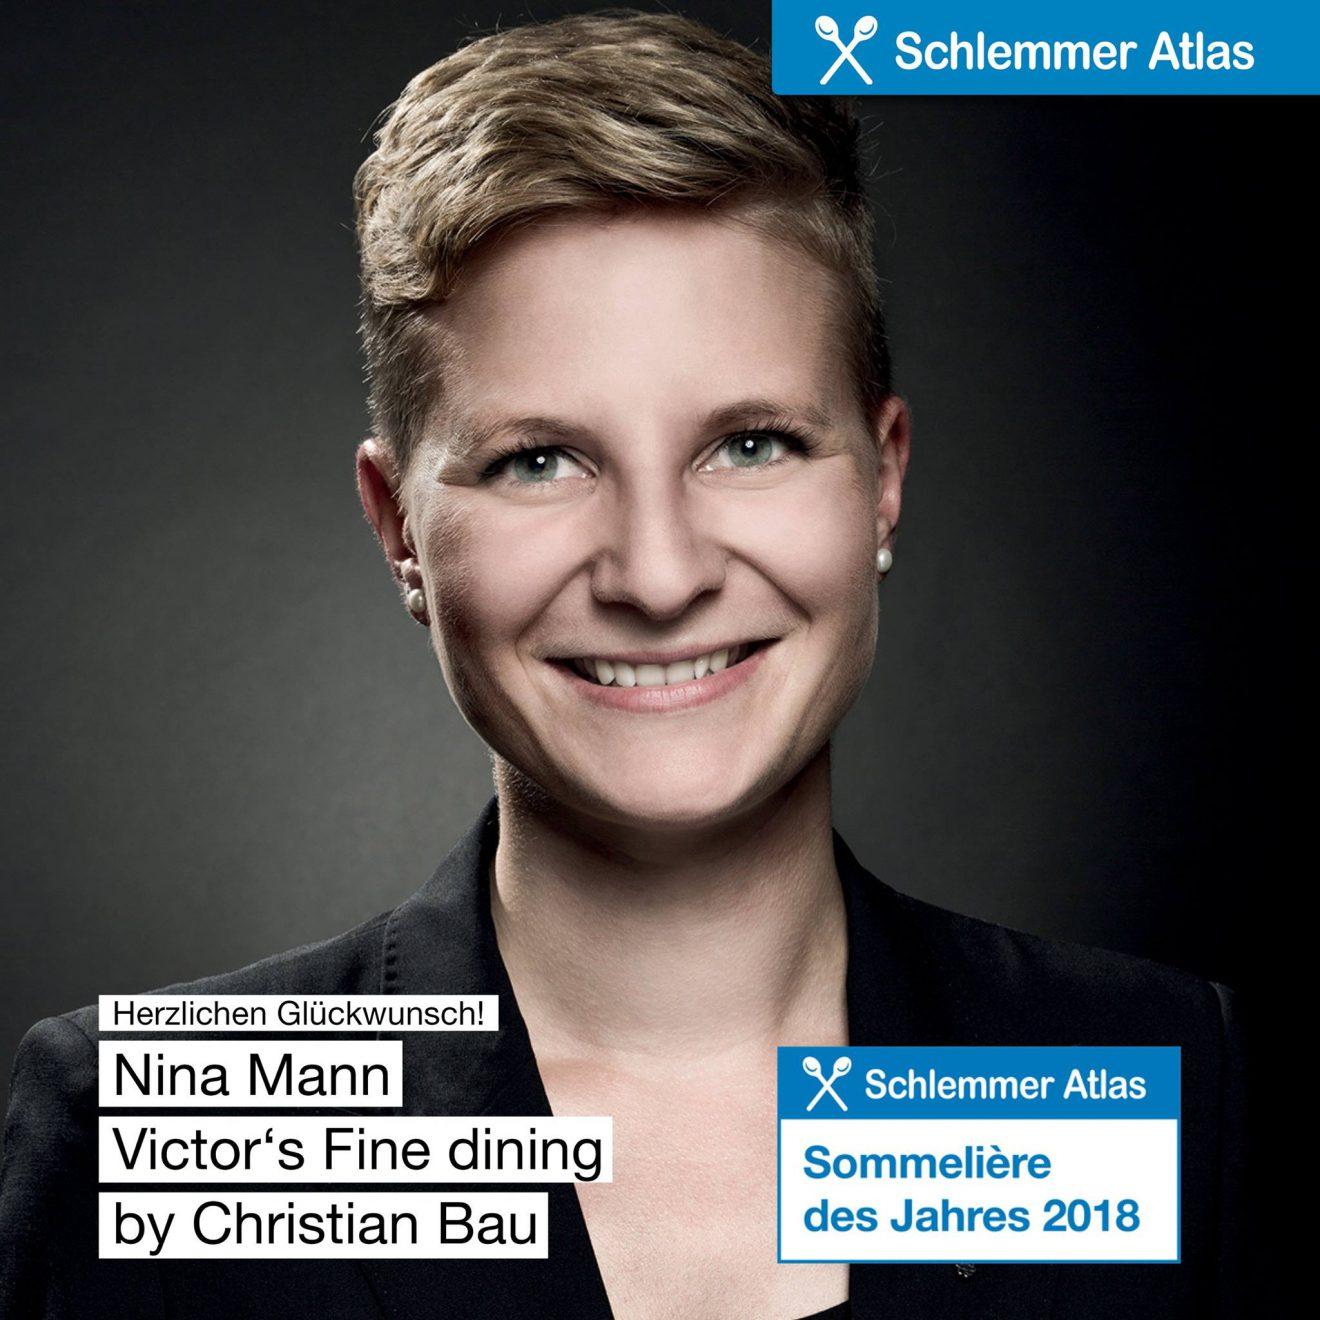 Nina Mann ist Sommelière des Jahres